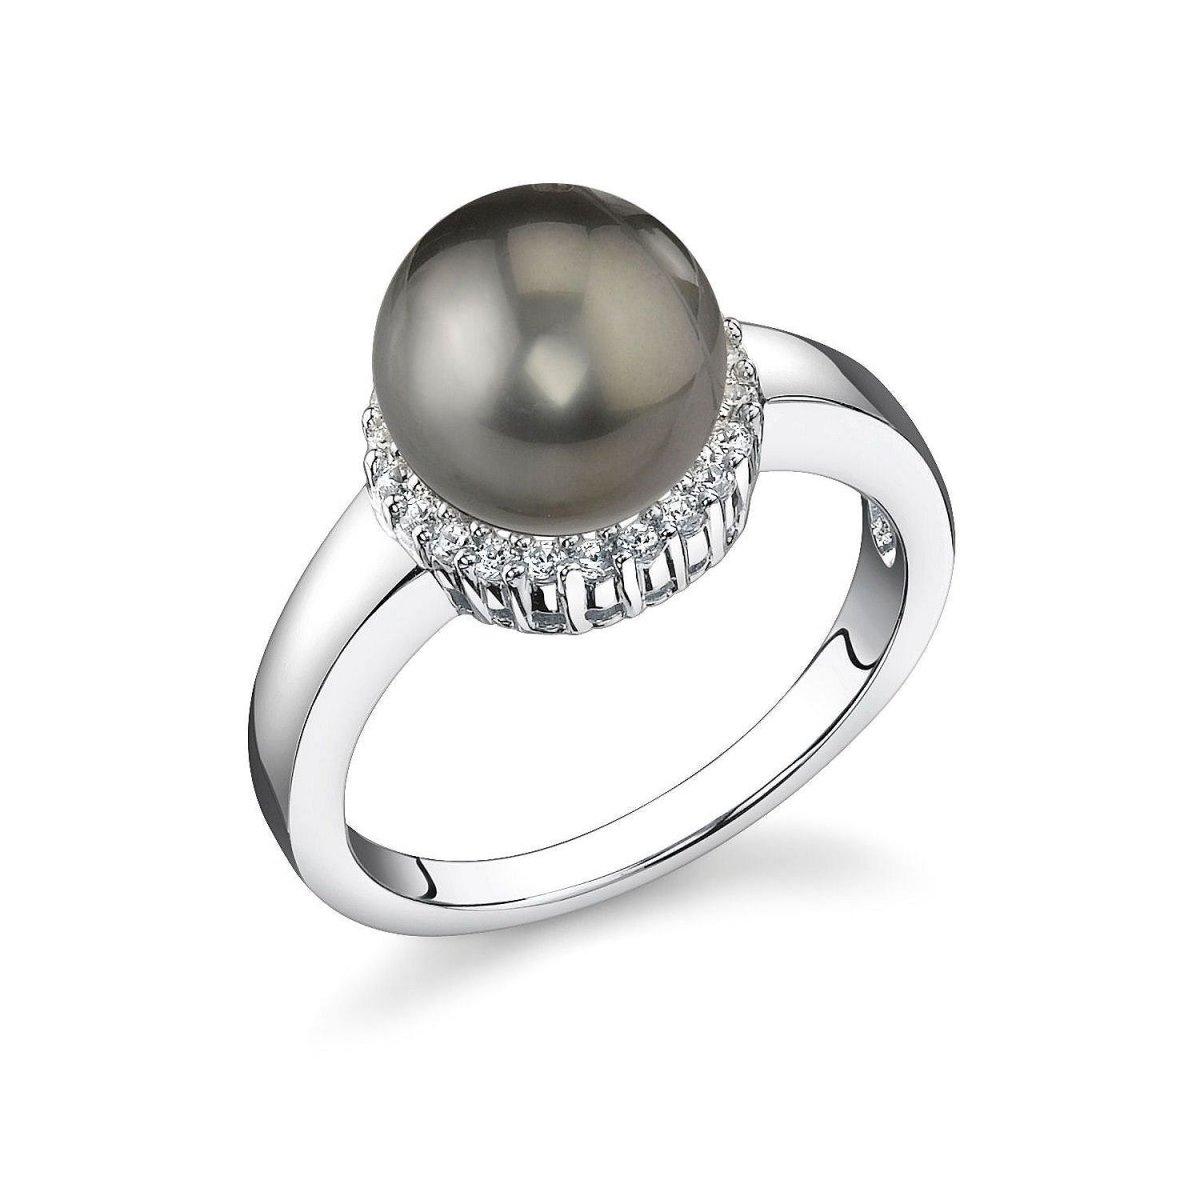 8mm Tahitian South Sea Cultured Pearl Ashley Ring